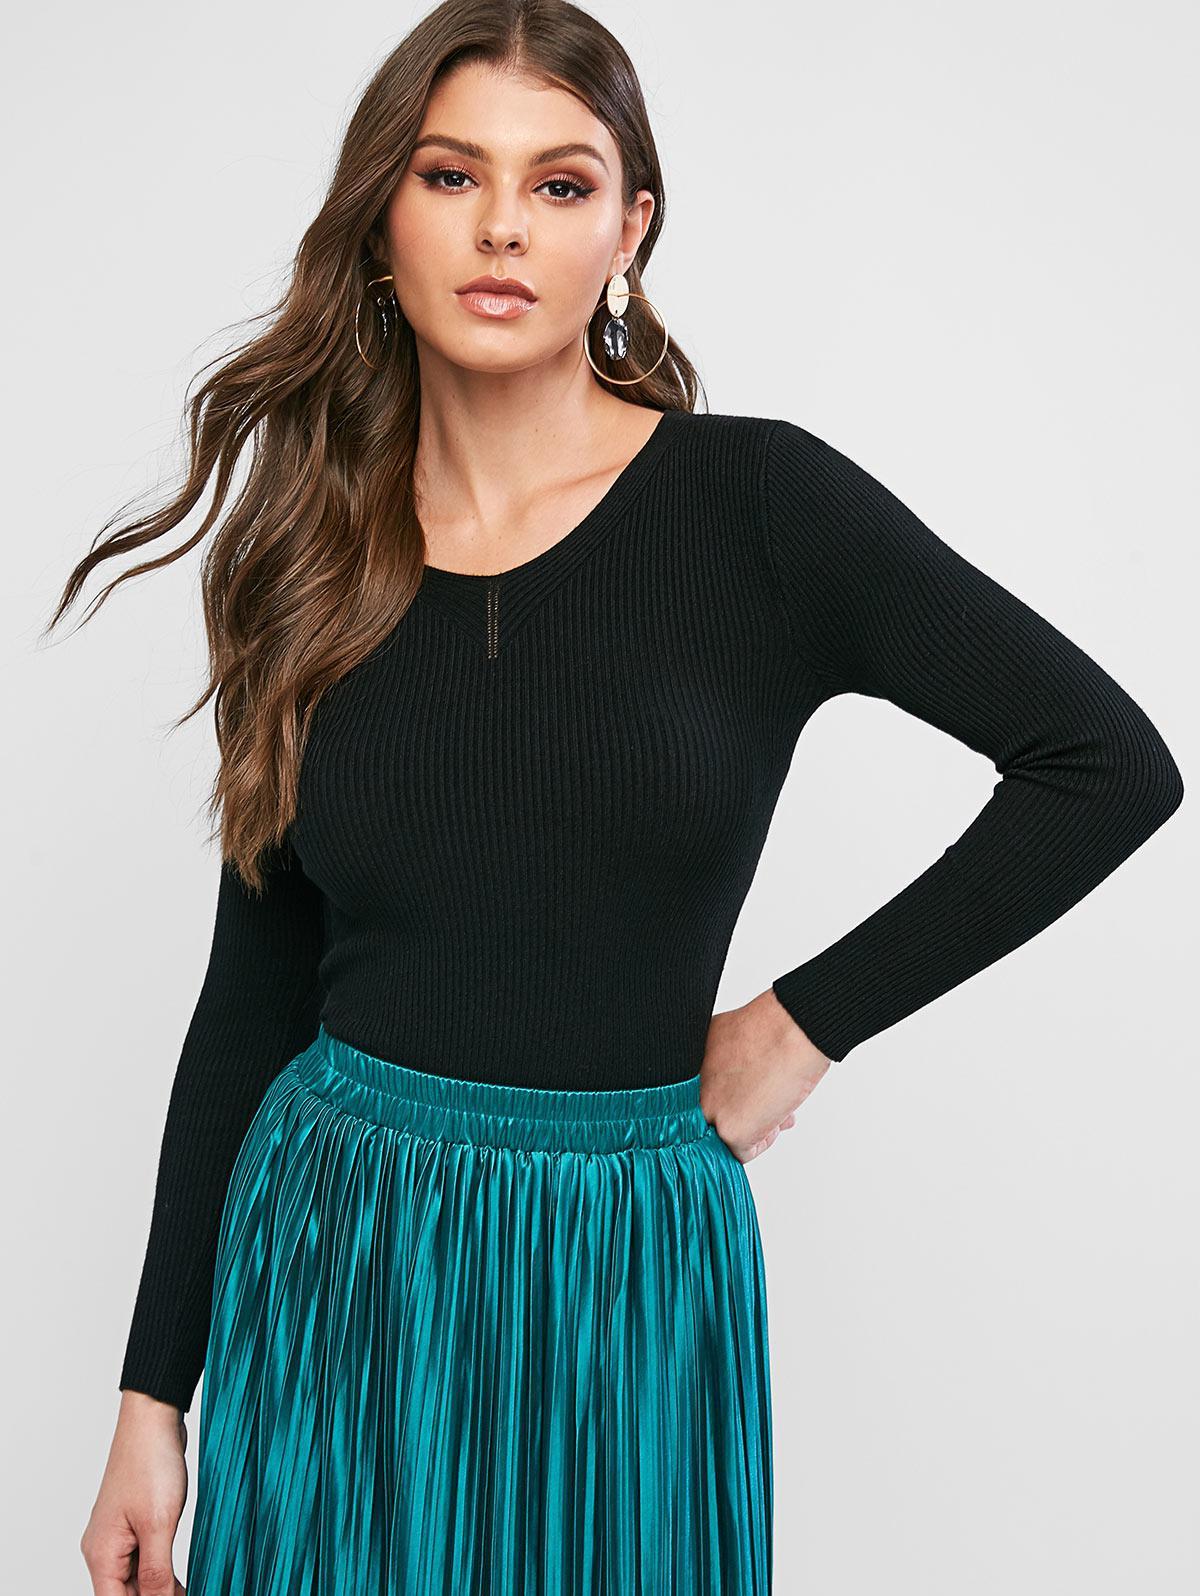 Ribbed Slim Knitted V Neck Sweater